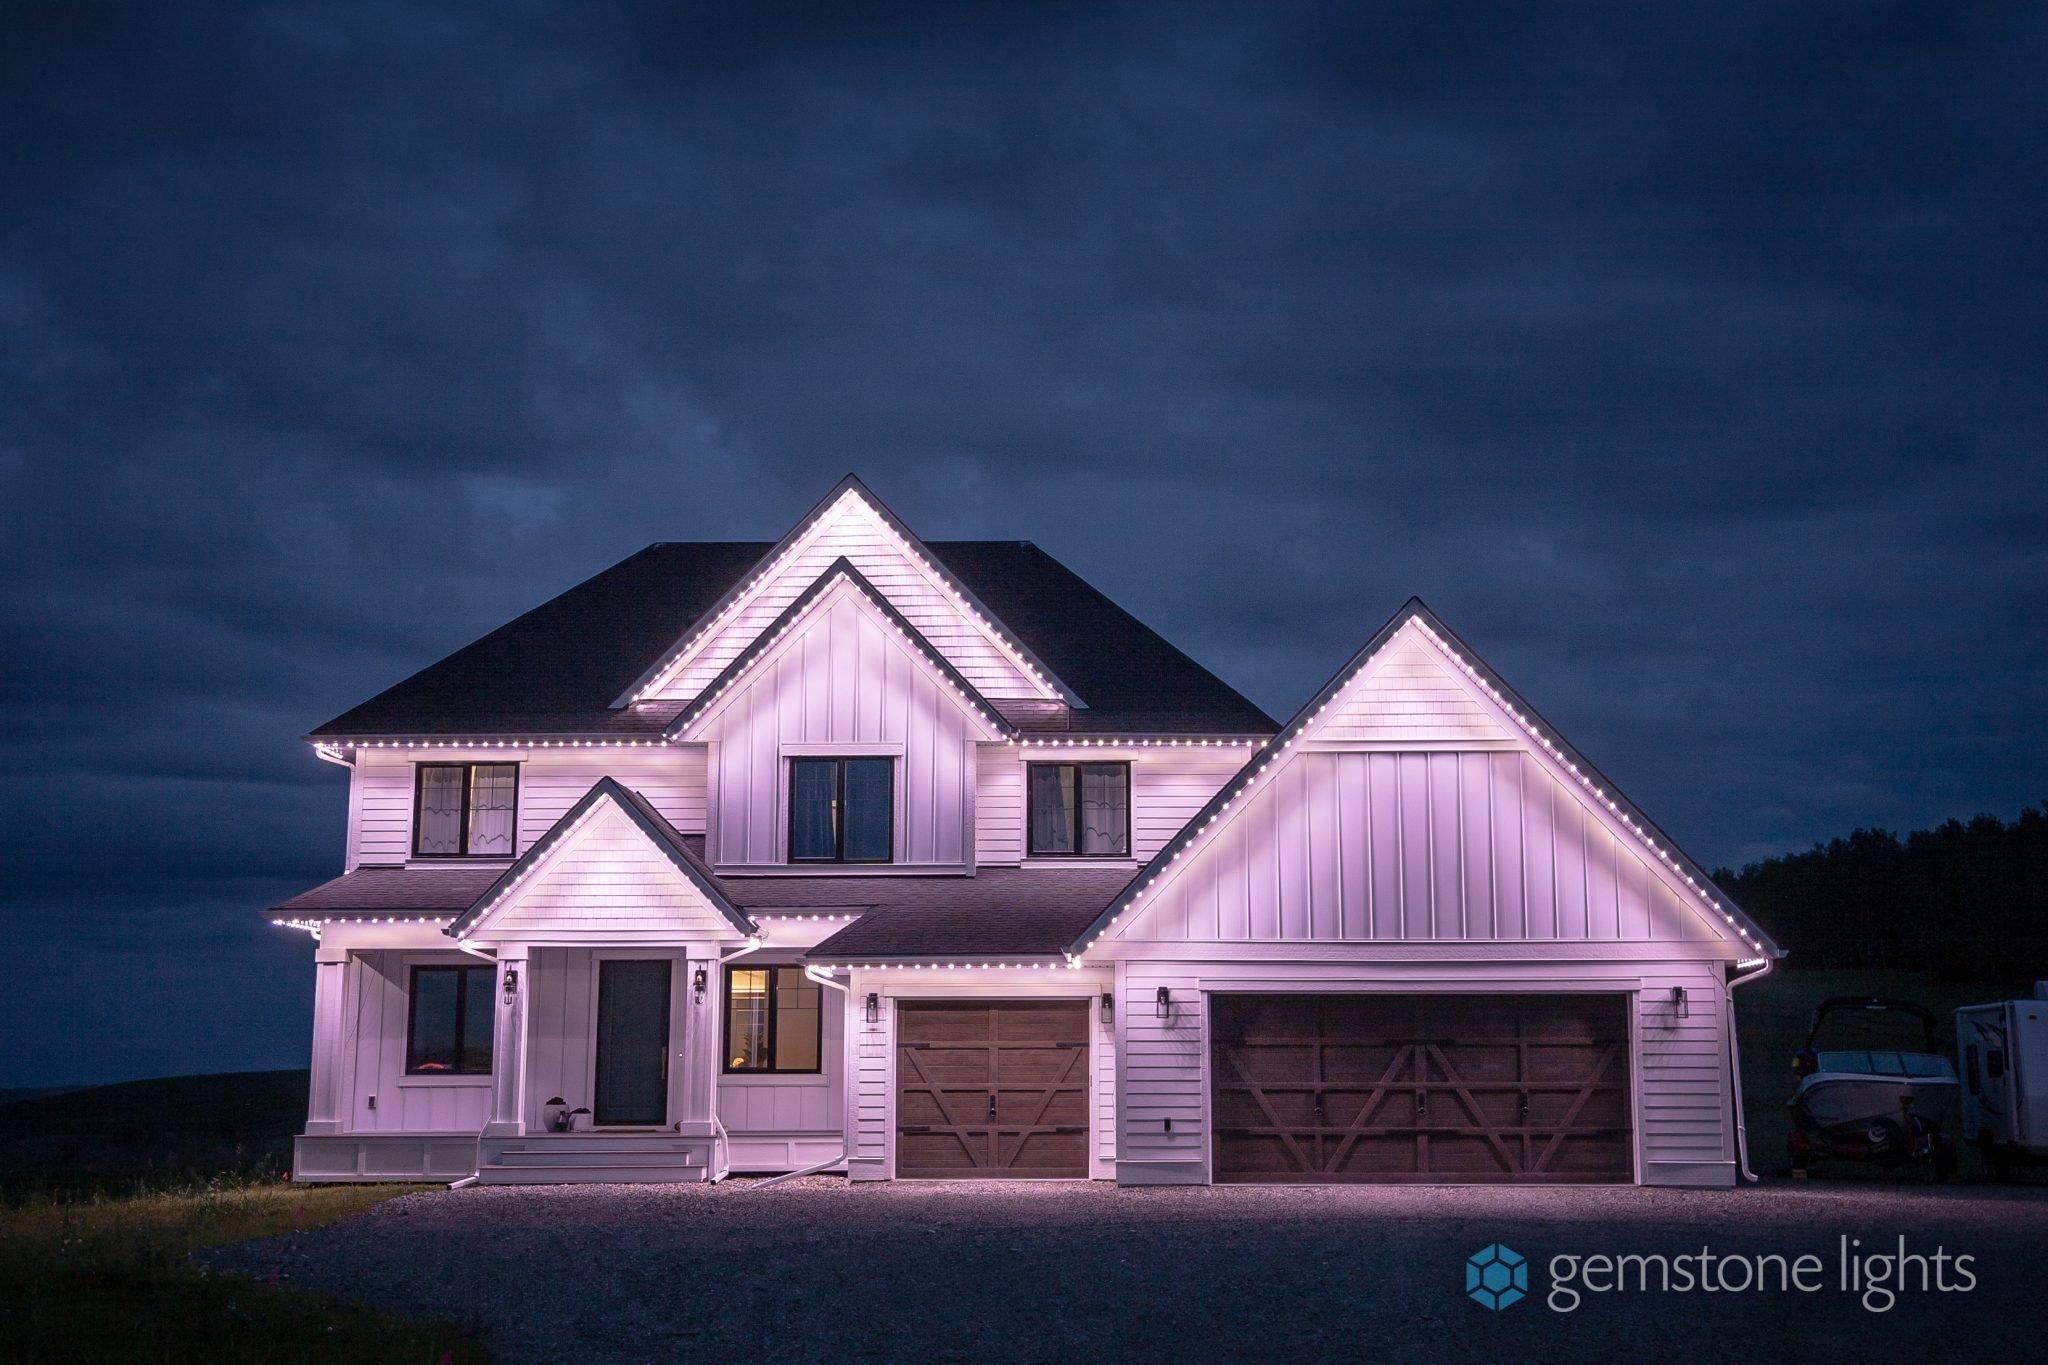 Exterior Led Lighting Guide 2020 10 Photos Gemstone Lights